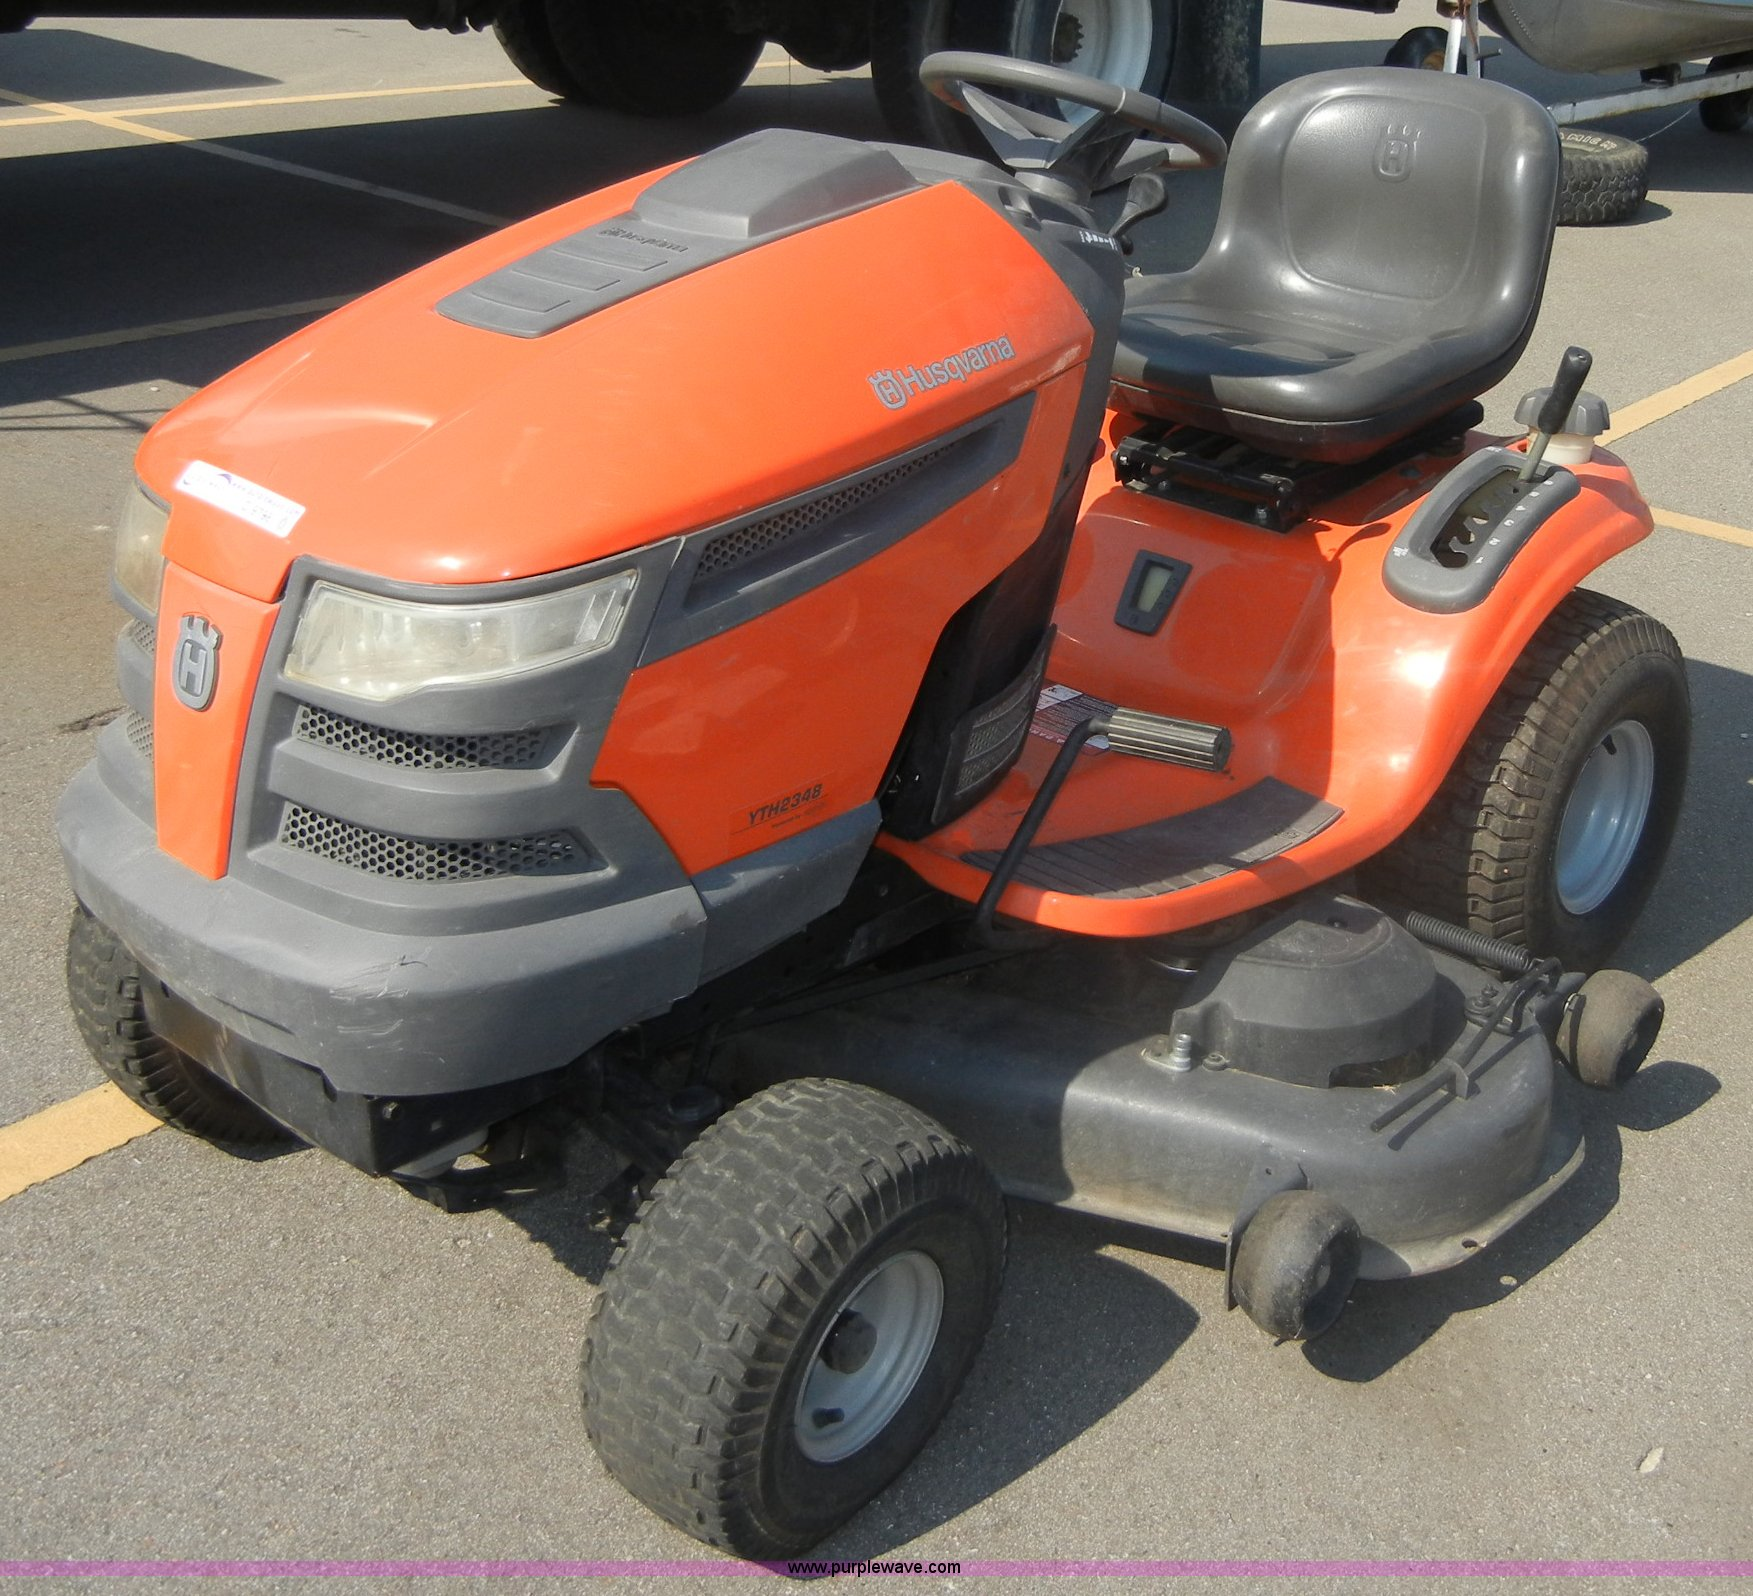 Husqvarna YTH2348 lawn tractor | Item D9798 | SOLD! Septembe